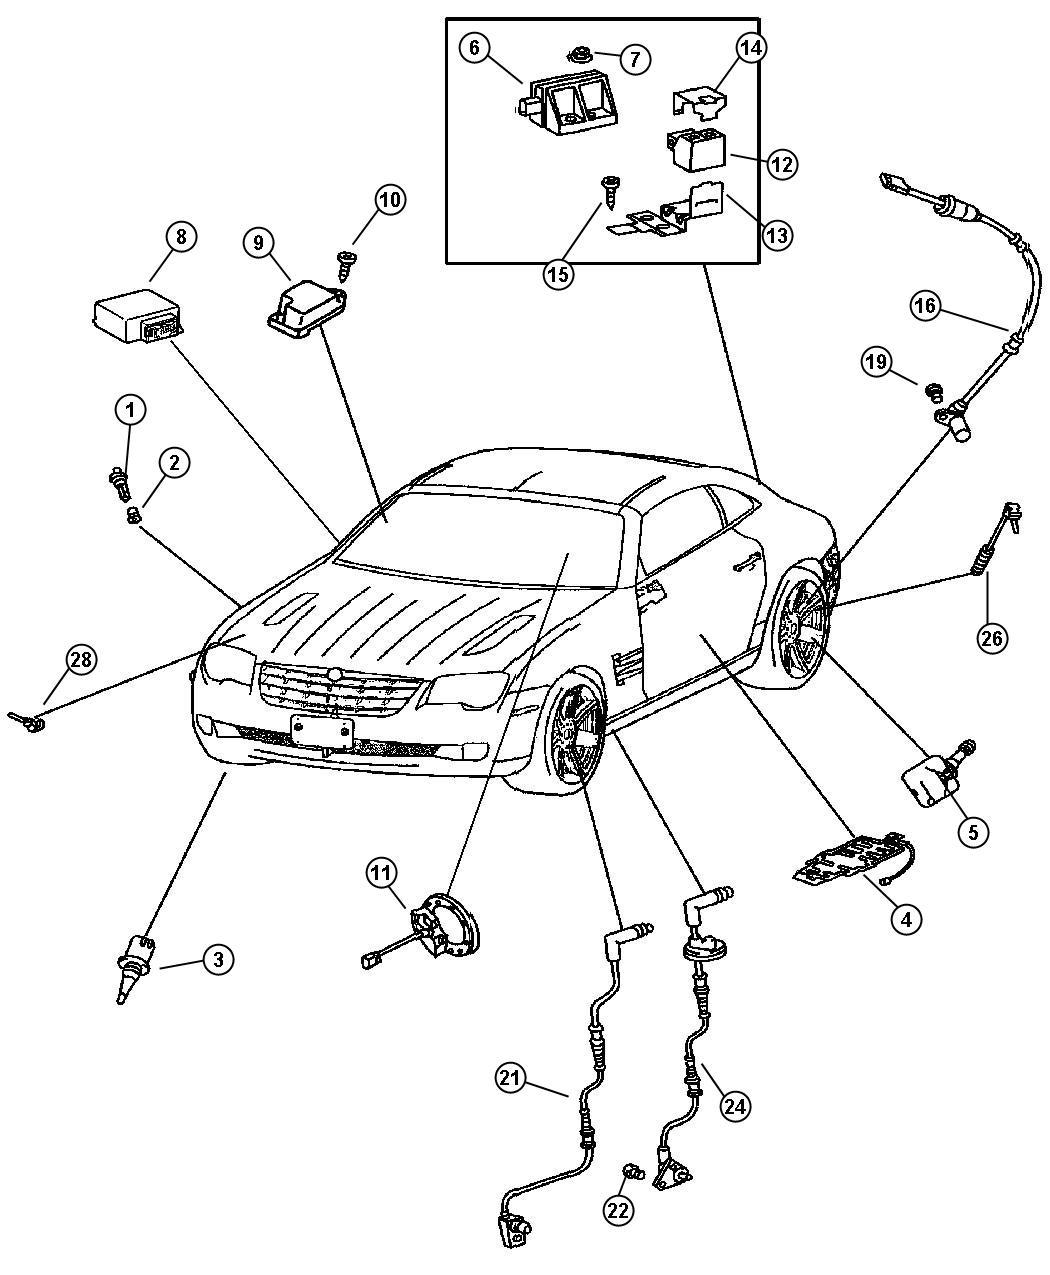 2006 Chrysler Crossfire Sensor. Washer fluid level. Trim ...